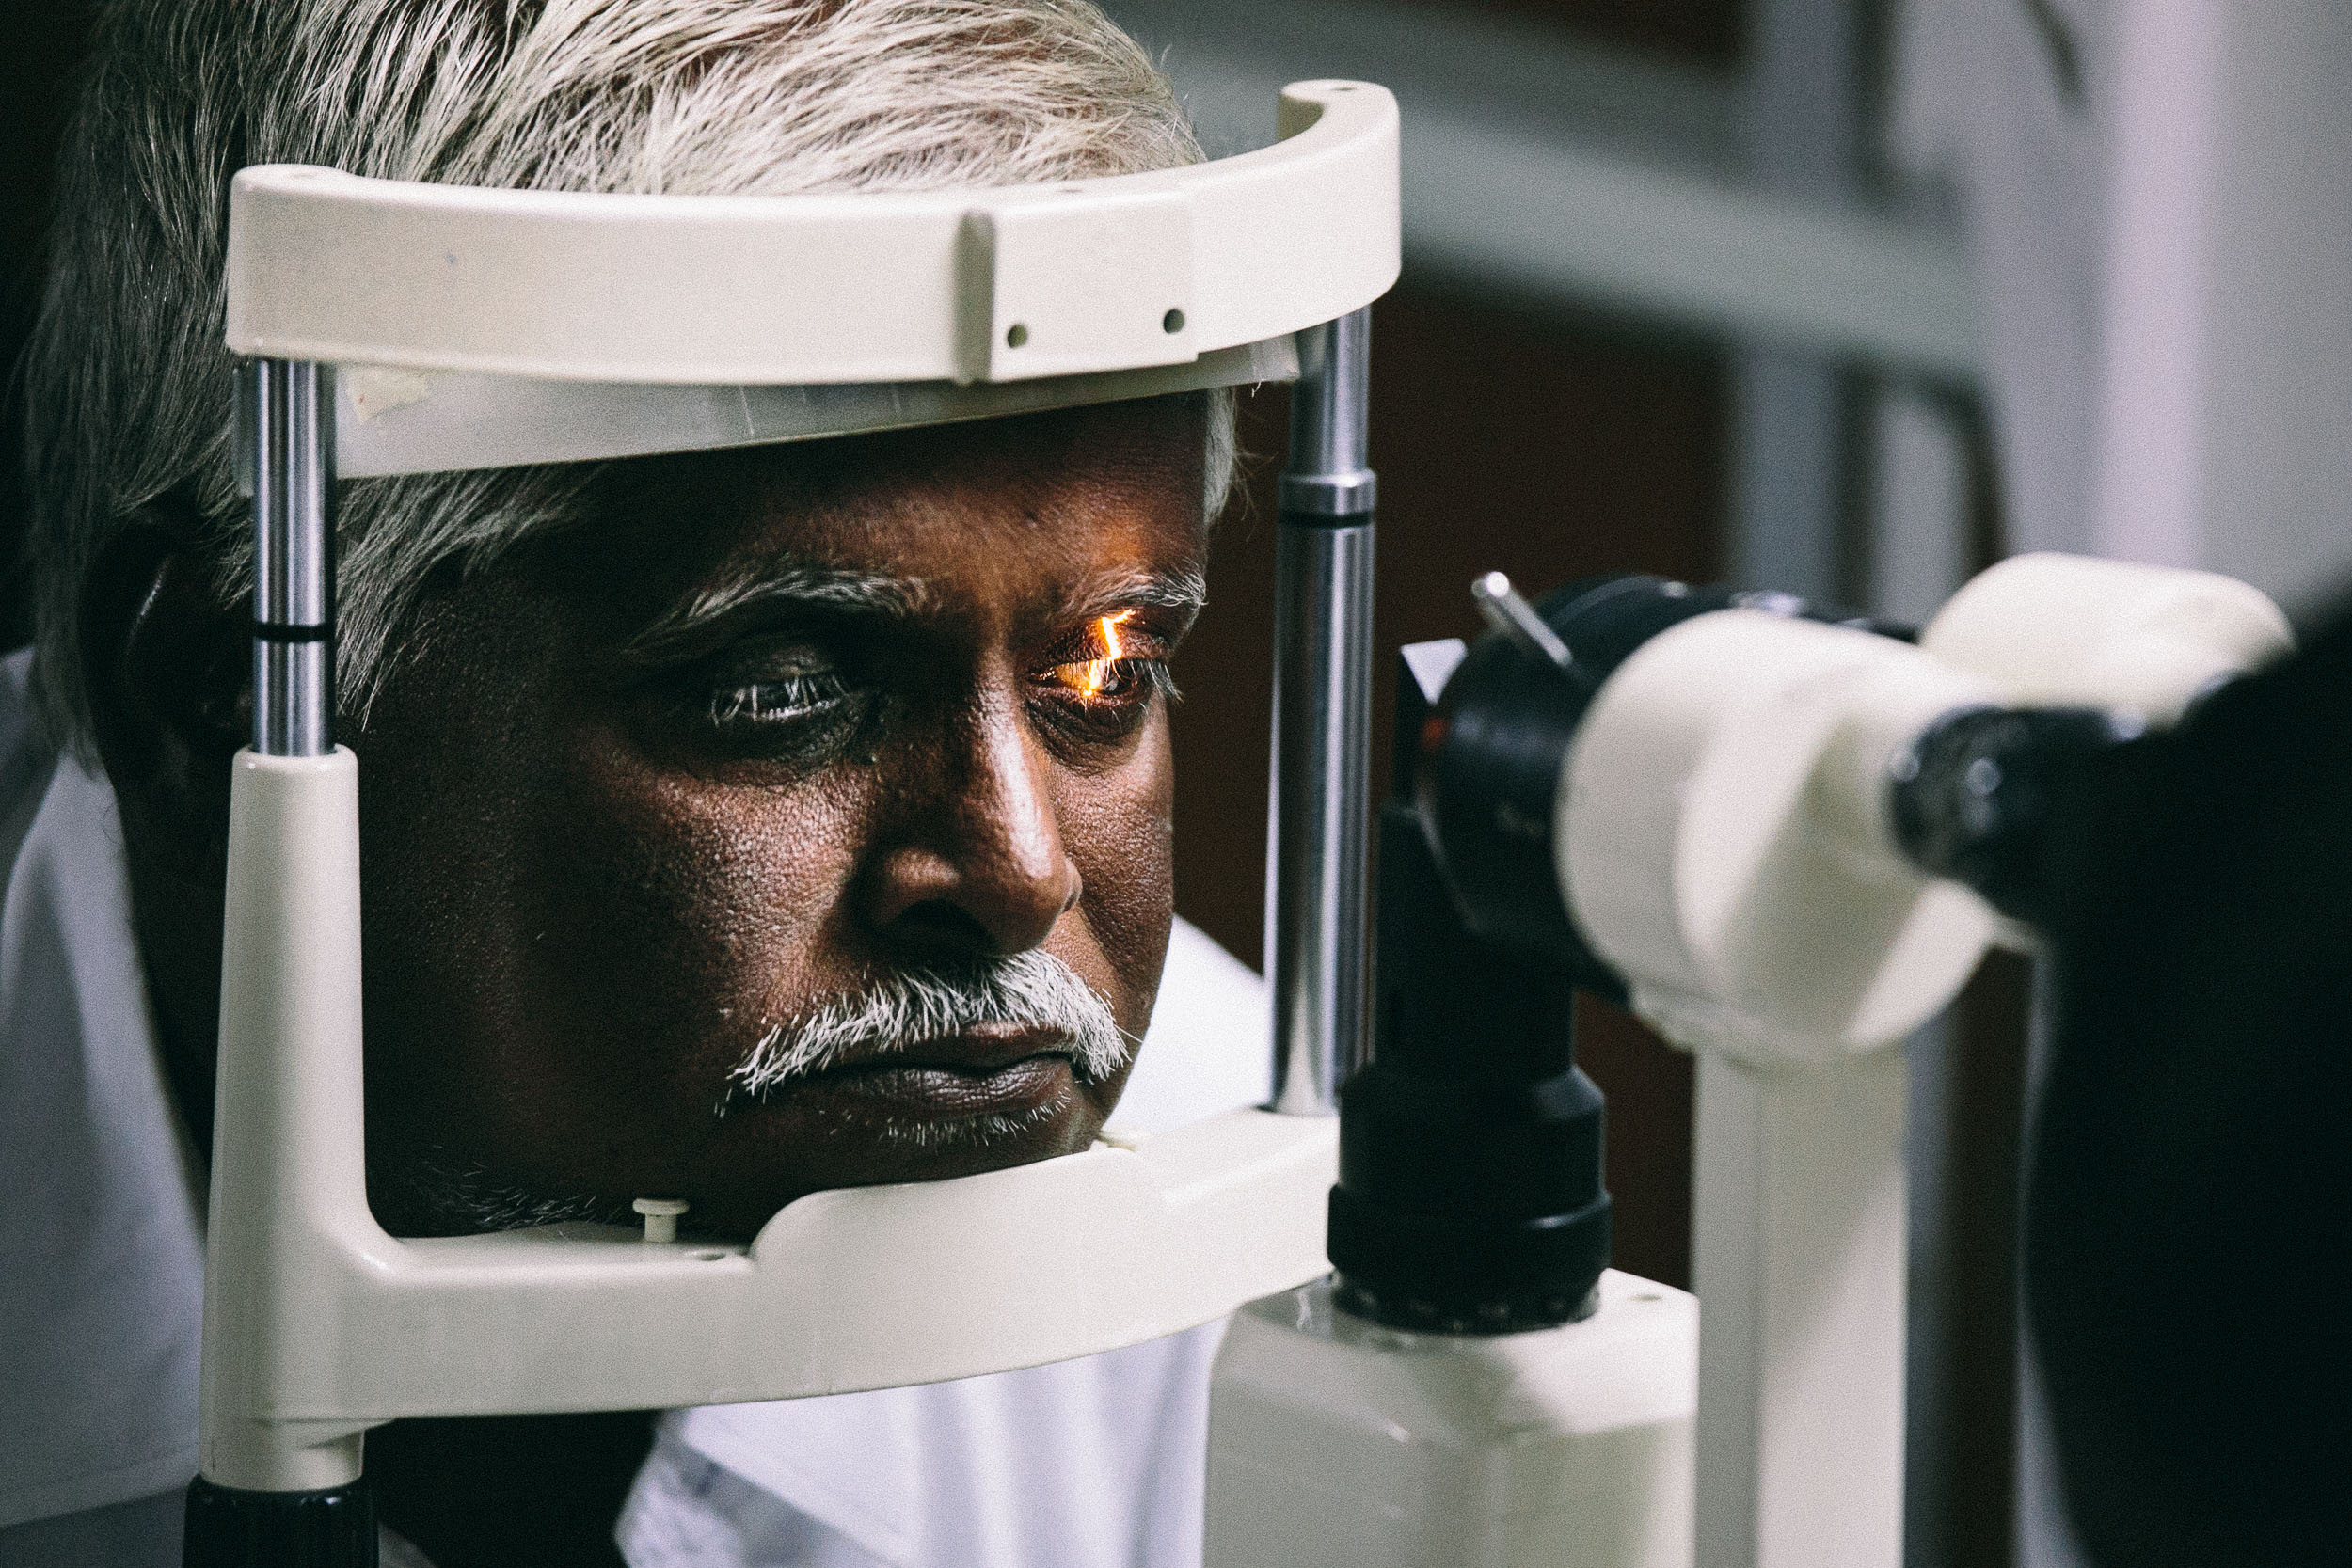 brian-callaway-india-photography-aravind-eye-hospital-43.jpg